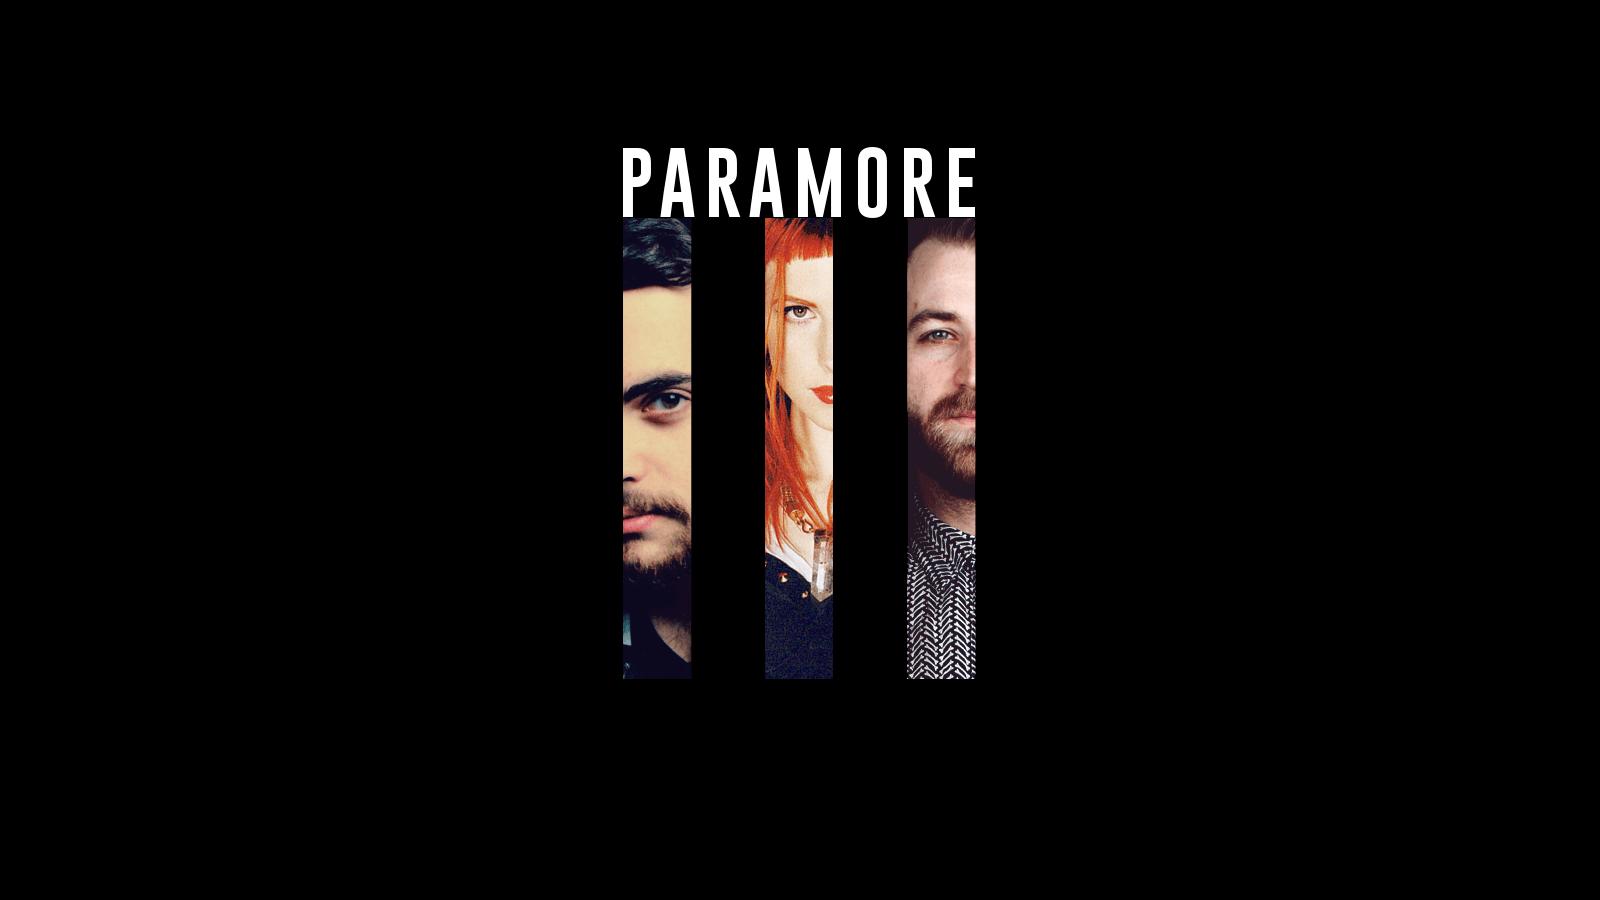 paramore logo mobile wallpapers